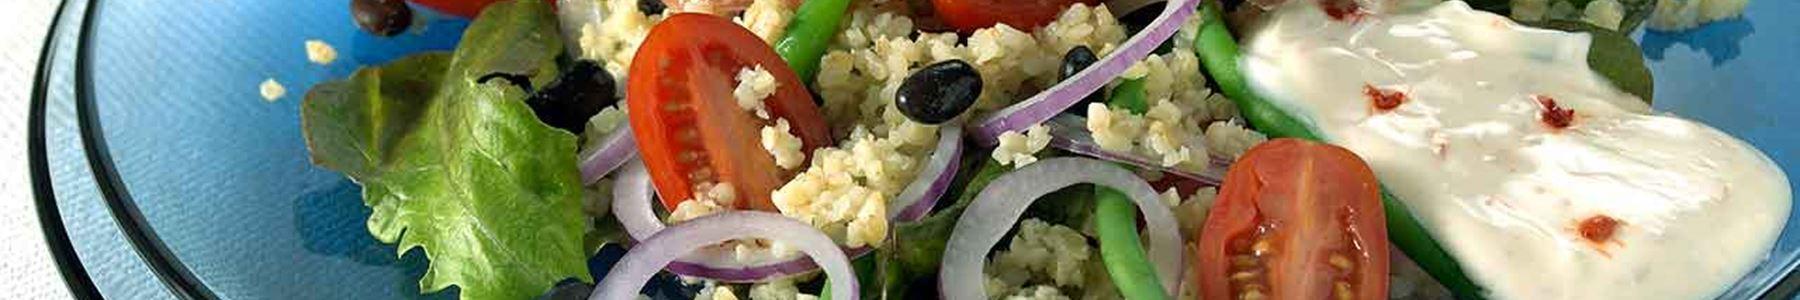 Kalorisnål + Skinka + Bönor + Lunch